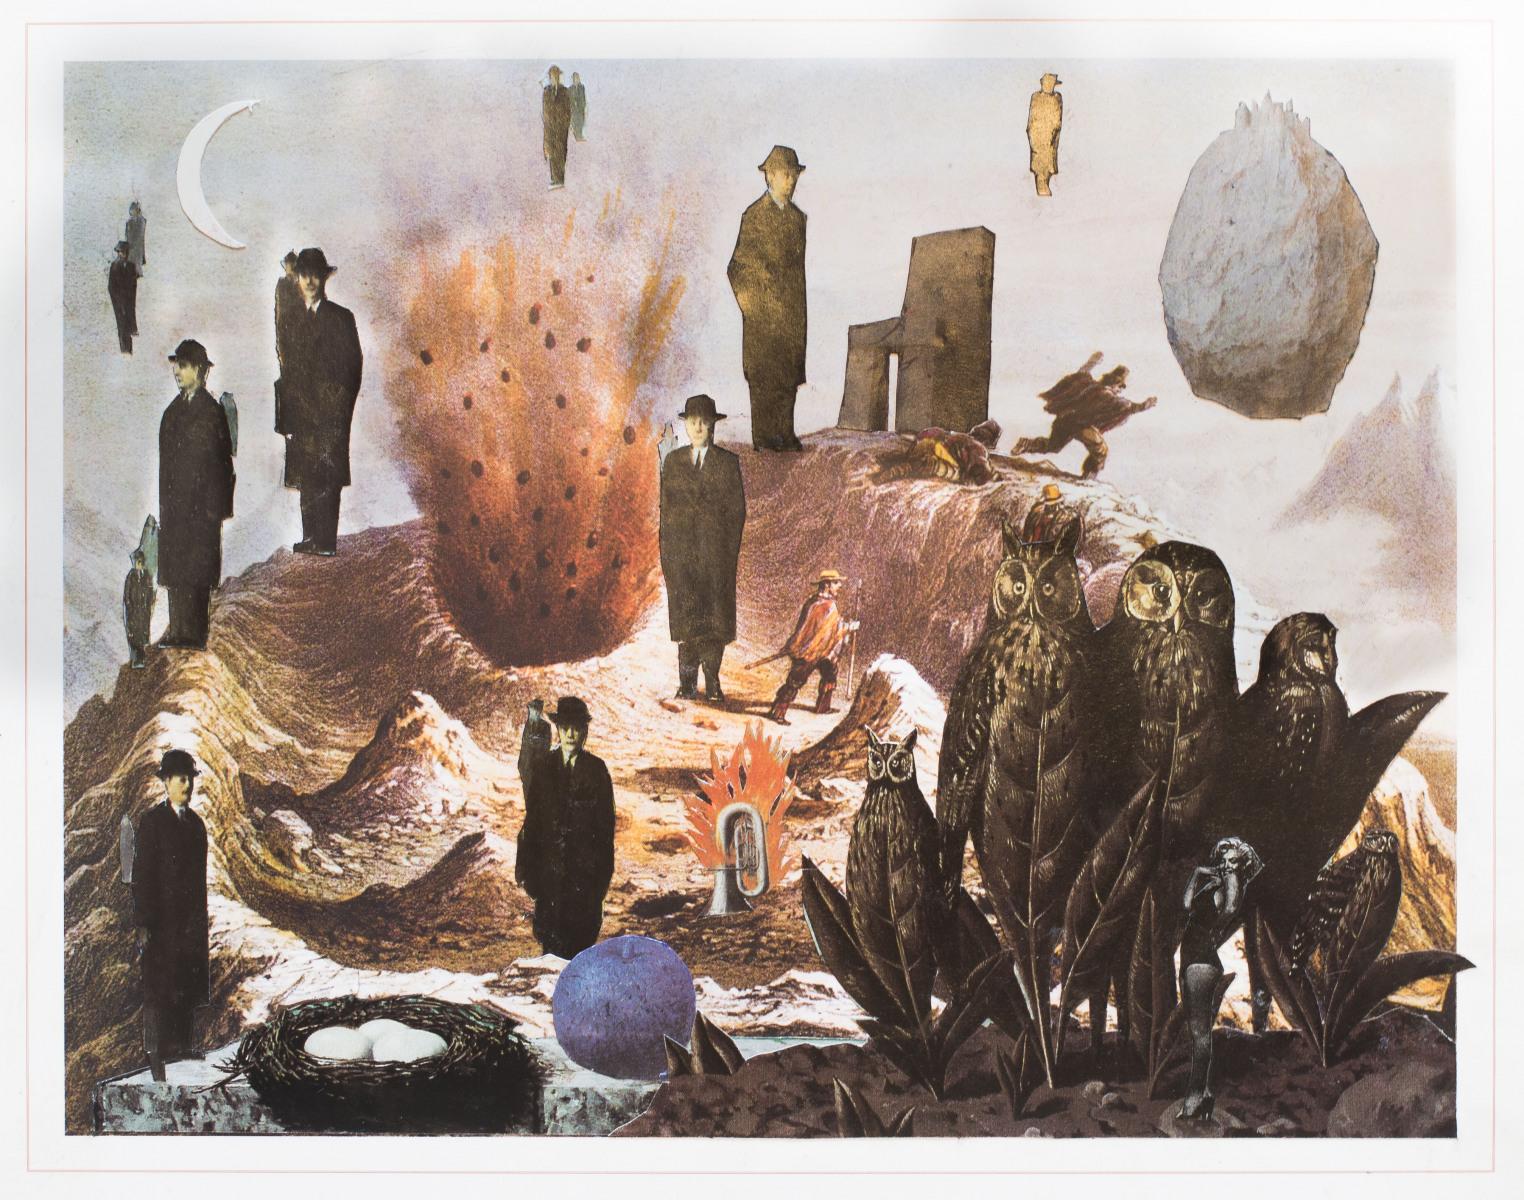 Vista del volcán Antuco de Magritte